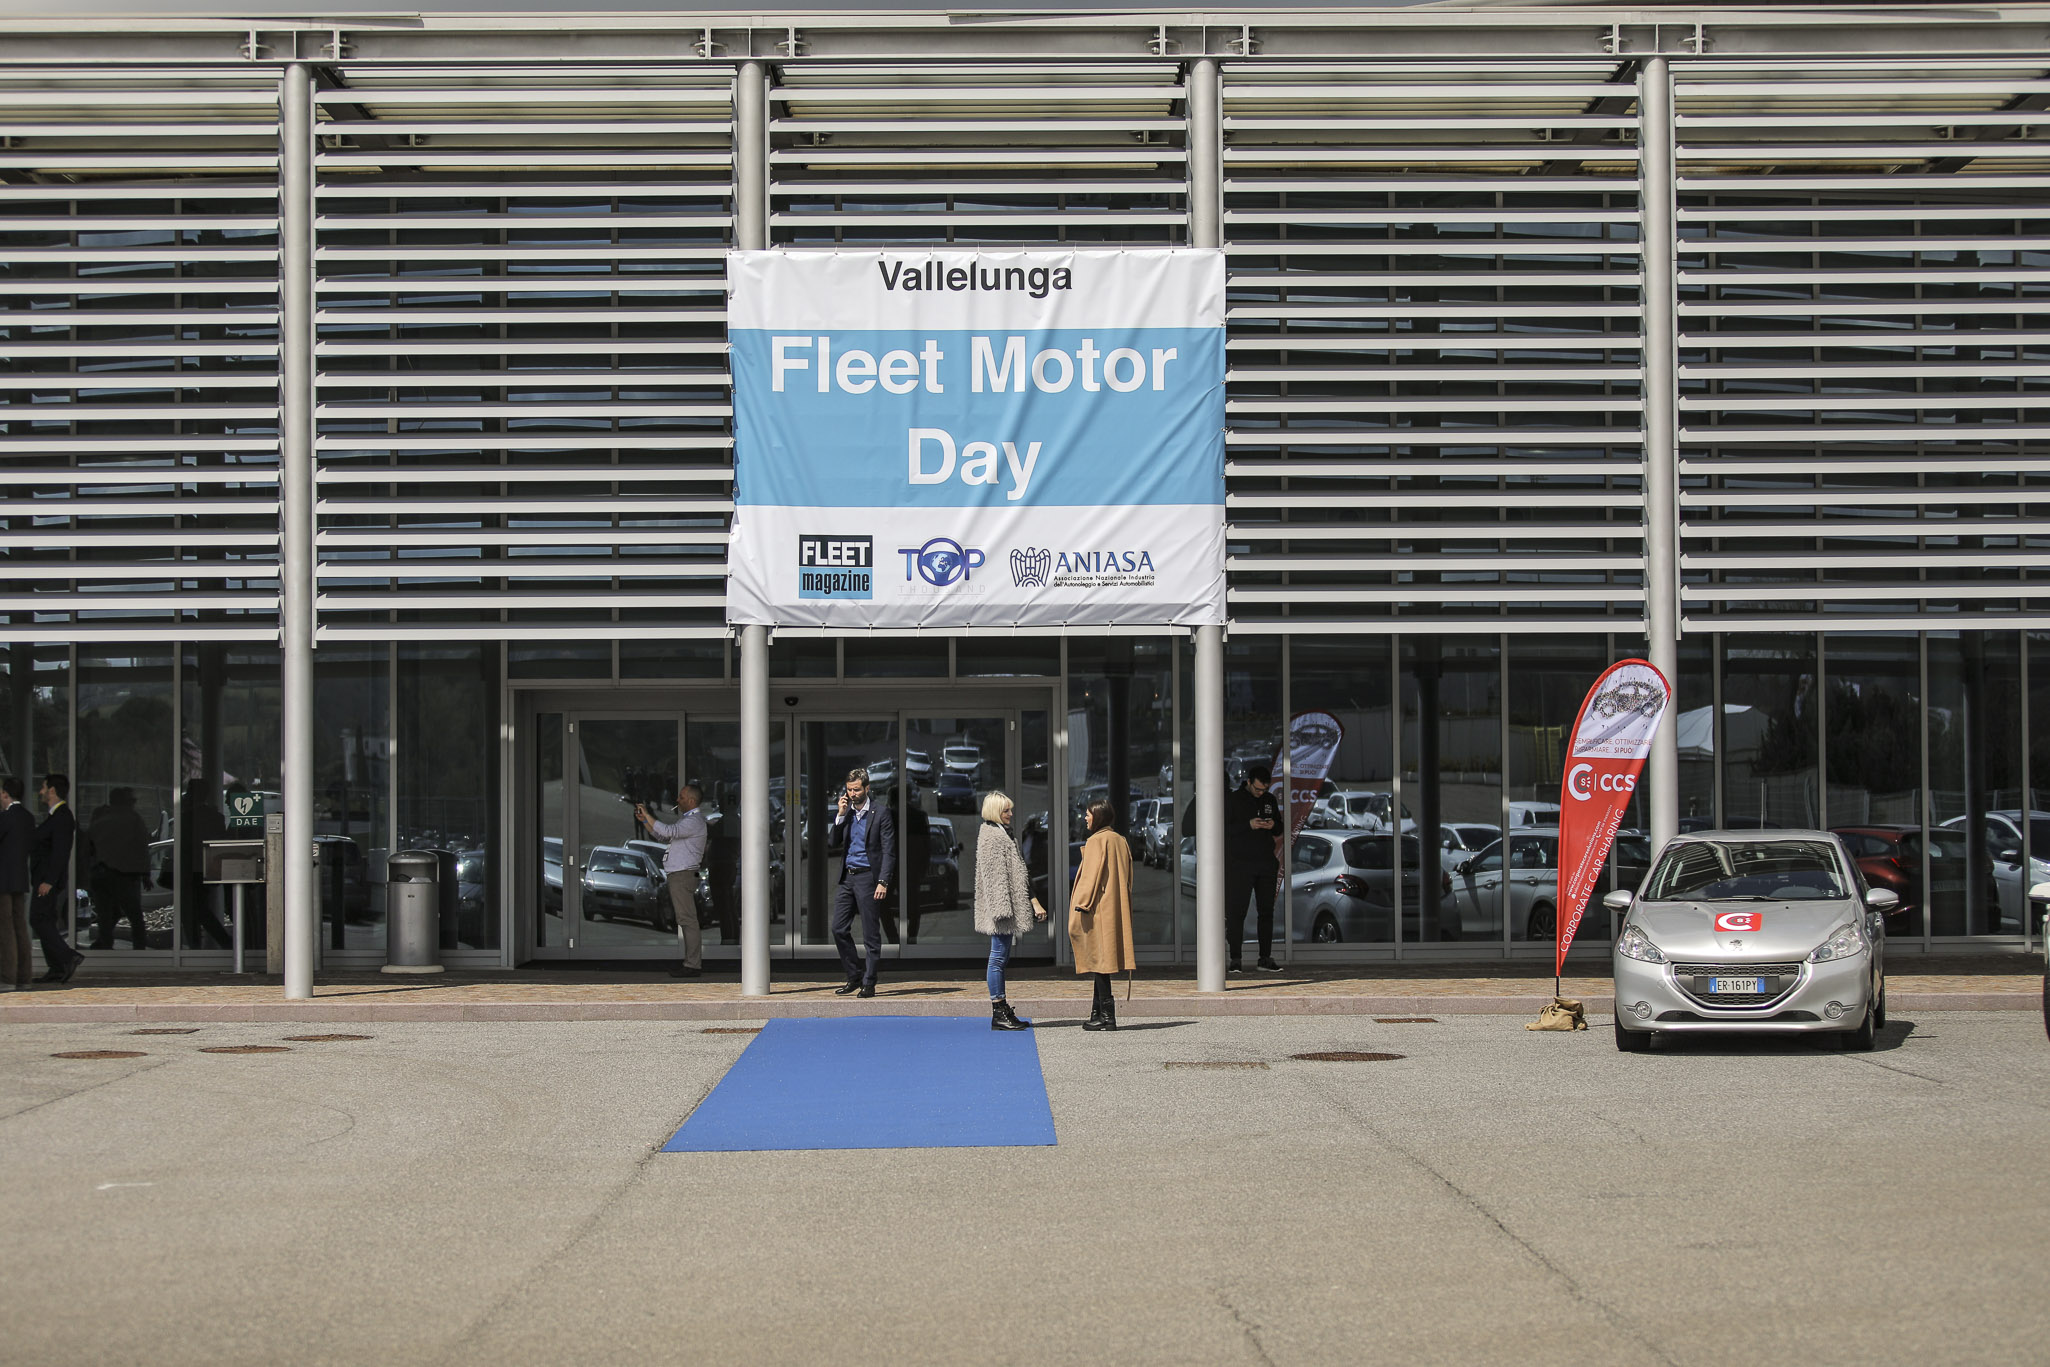 Fleet Motor Day 2019